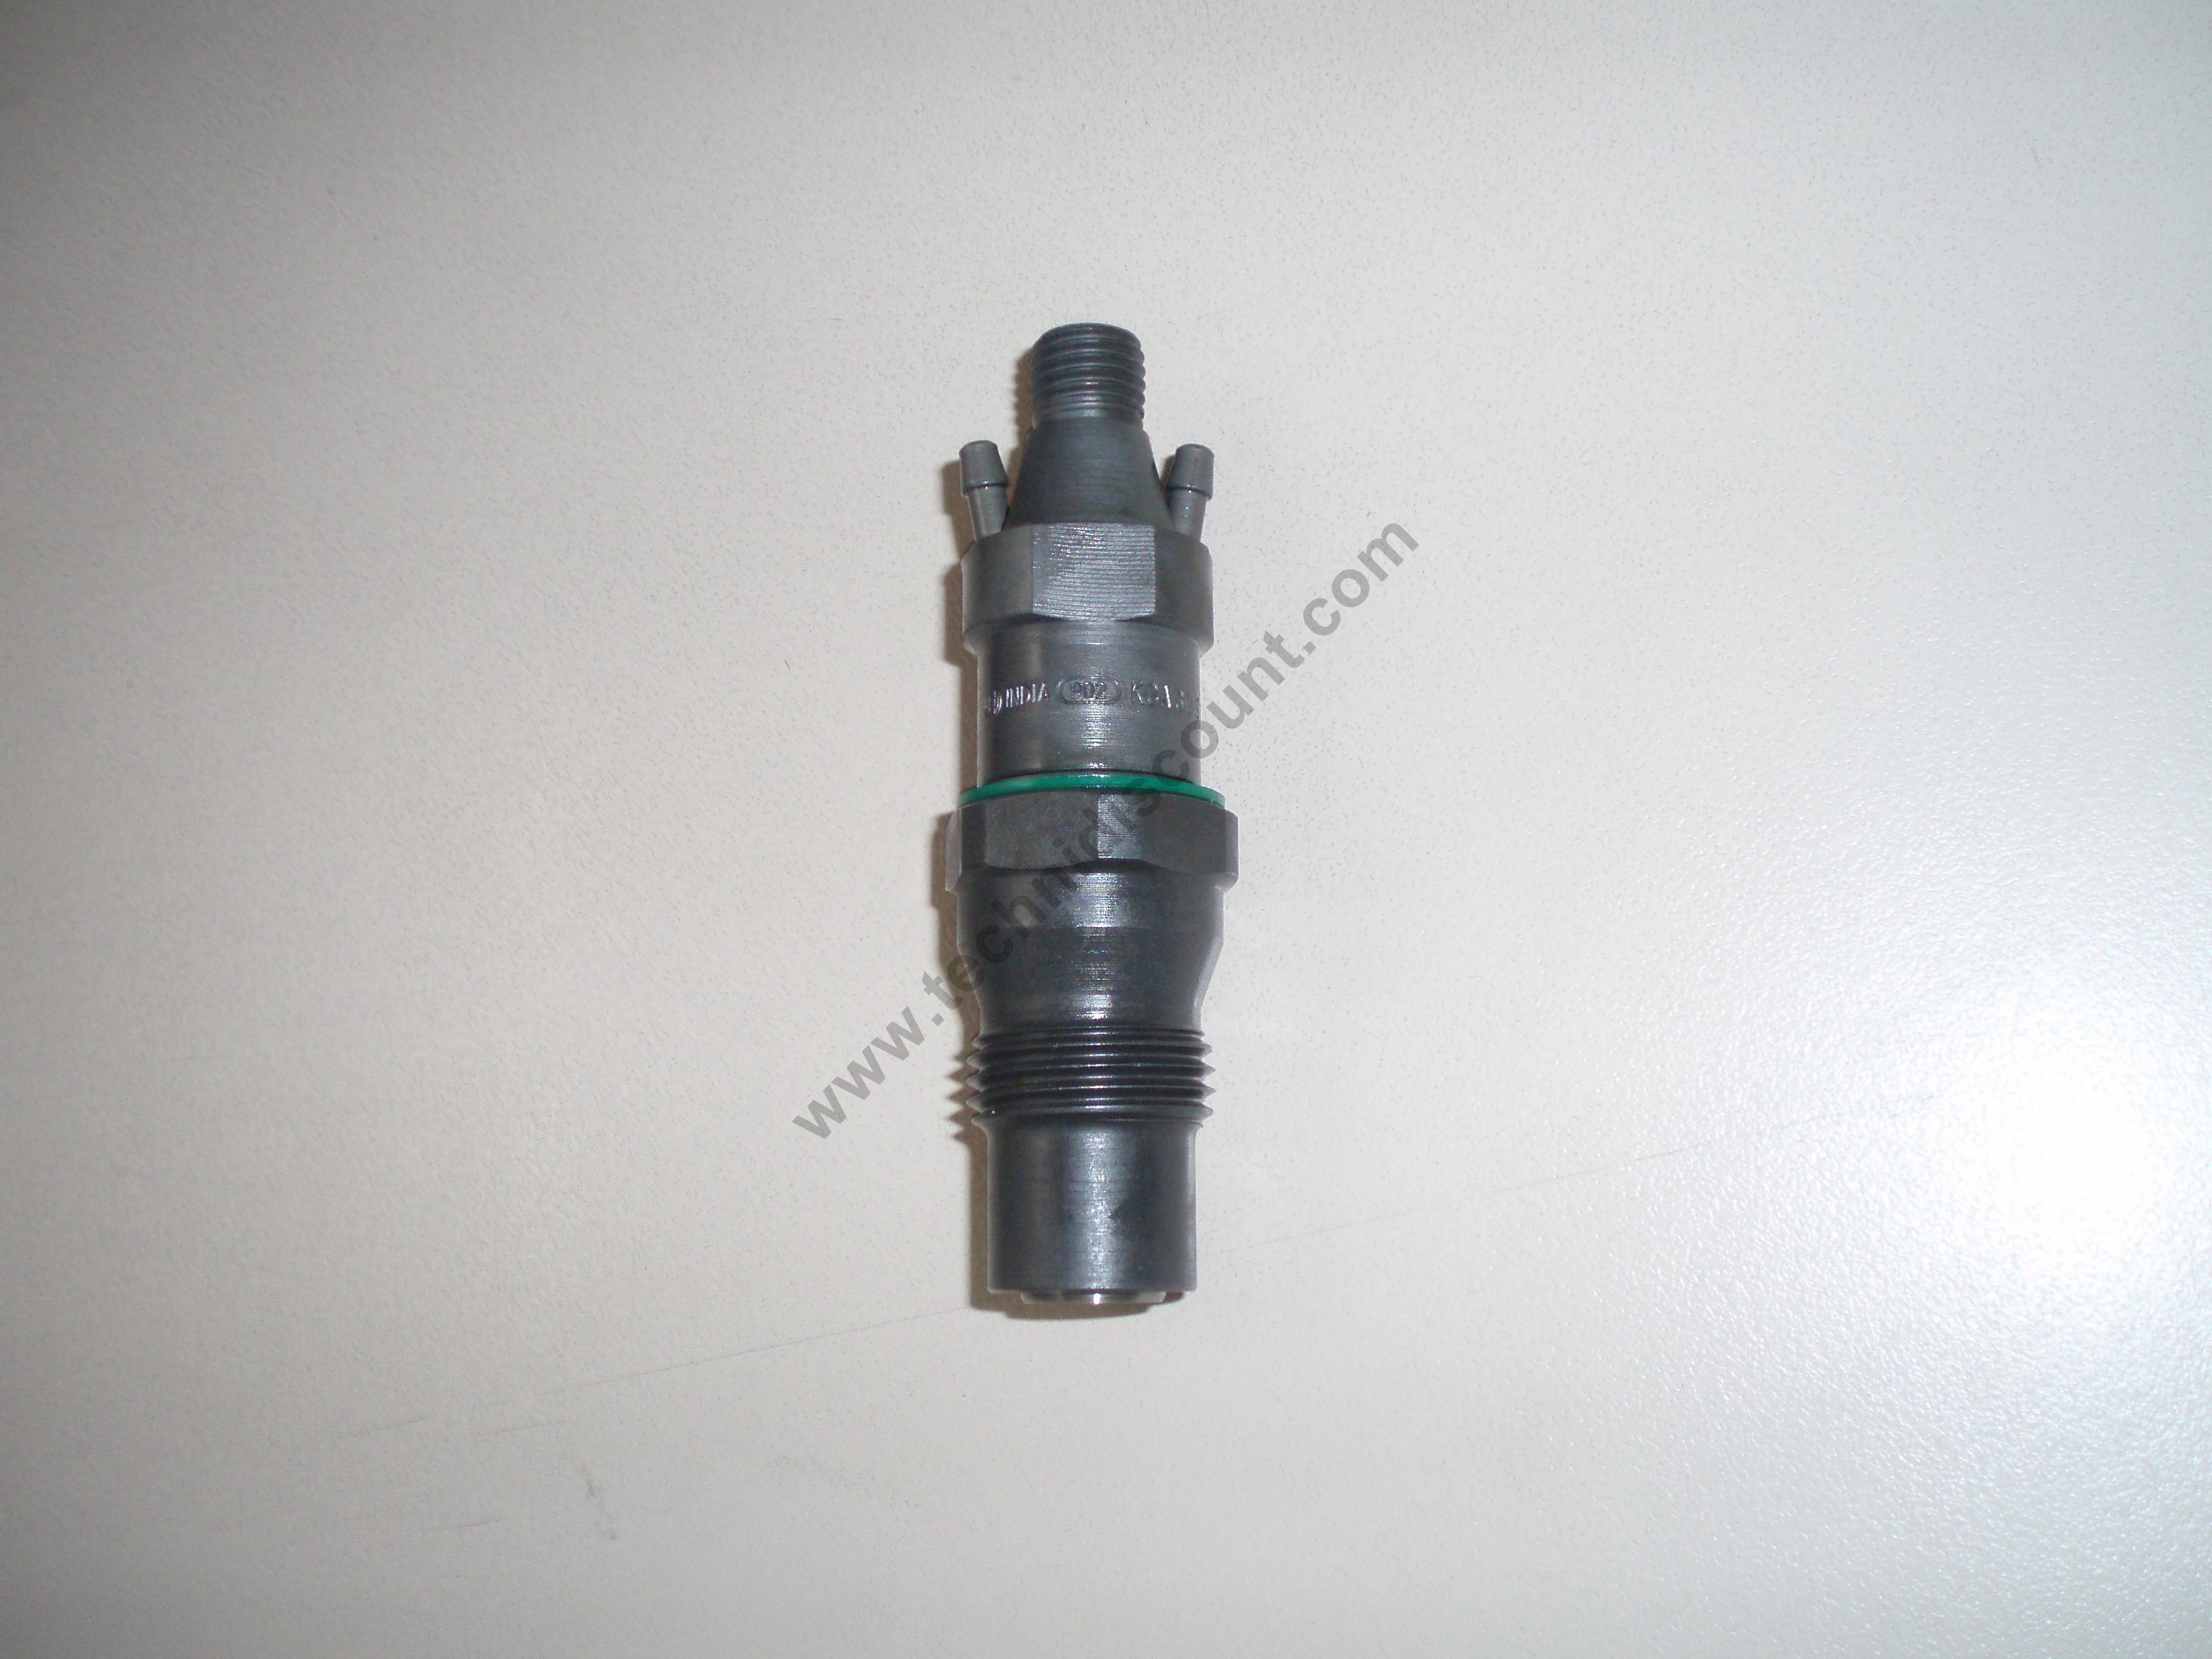 Porte Injecteur CHD LDW1503 LDW1603 LDW2004 LDW2204 KDW1603 KDW2204 LOMBARDINI 5010051 KOHLER ED005100510-S